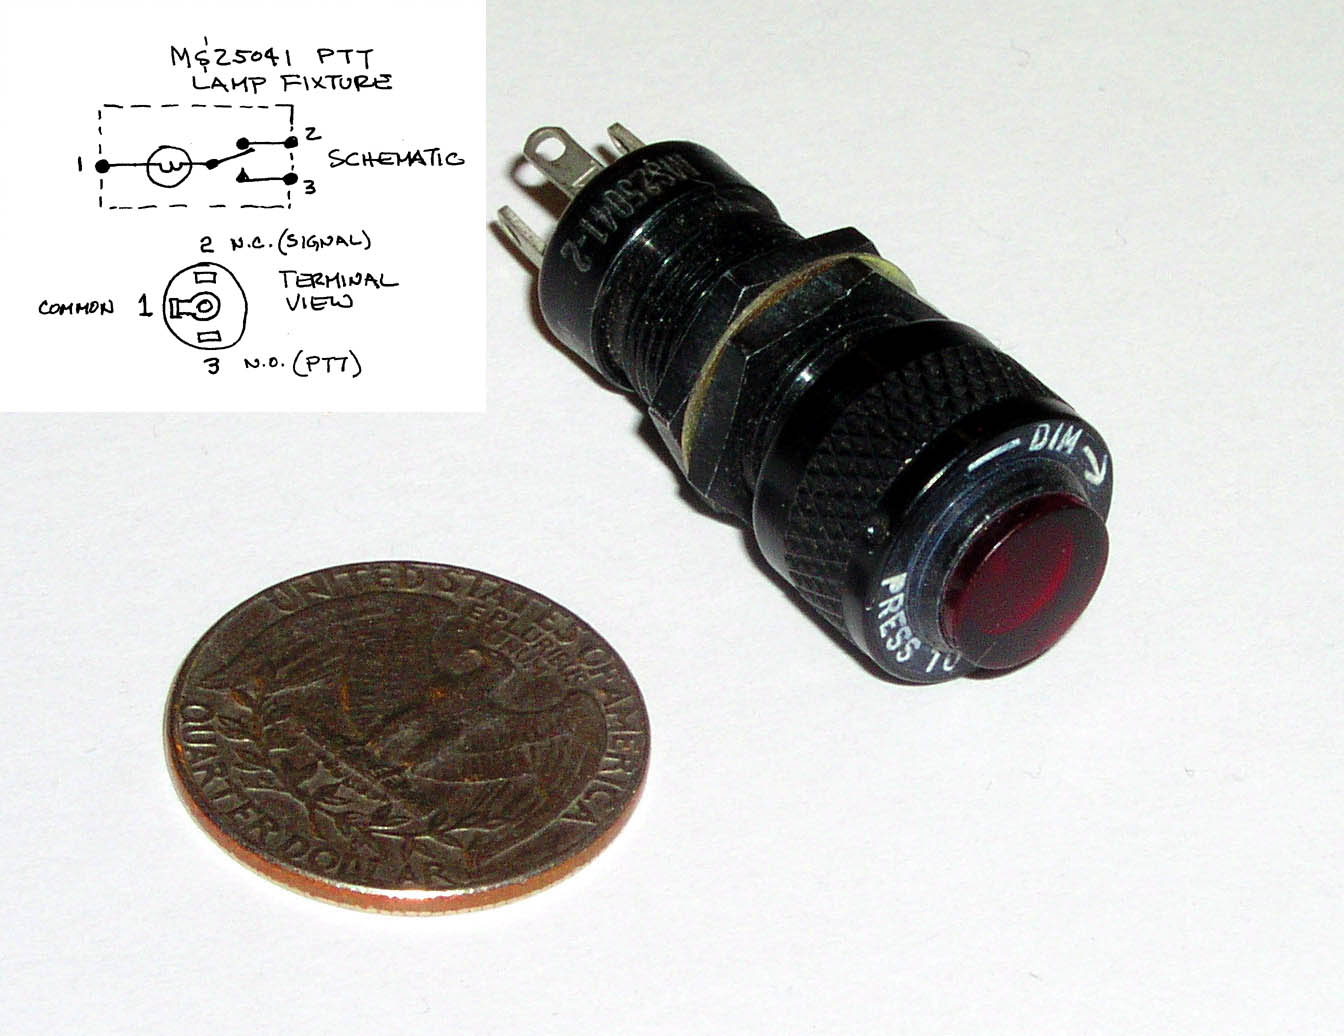 matronics email lists view topic push to test lamp rh lists matronics com Re Wiring-Diagram Montgomery Ward Re Wiring-Diagram Montgomery Ward